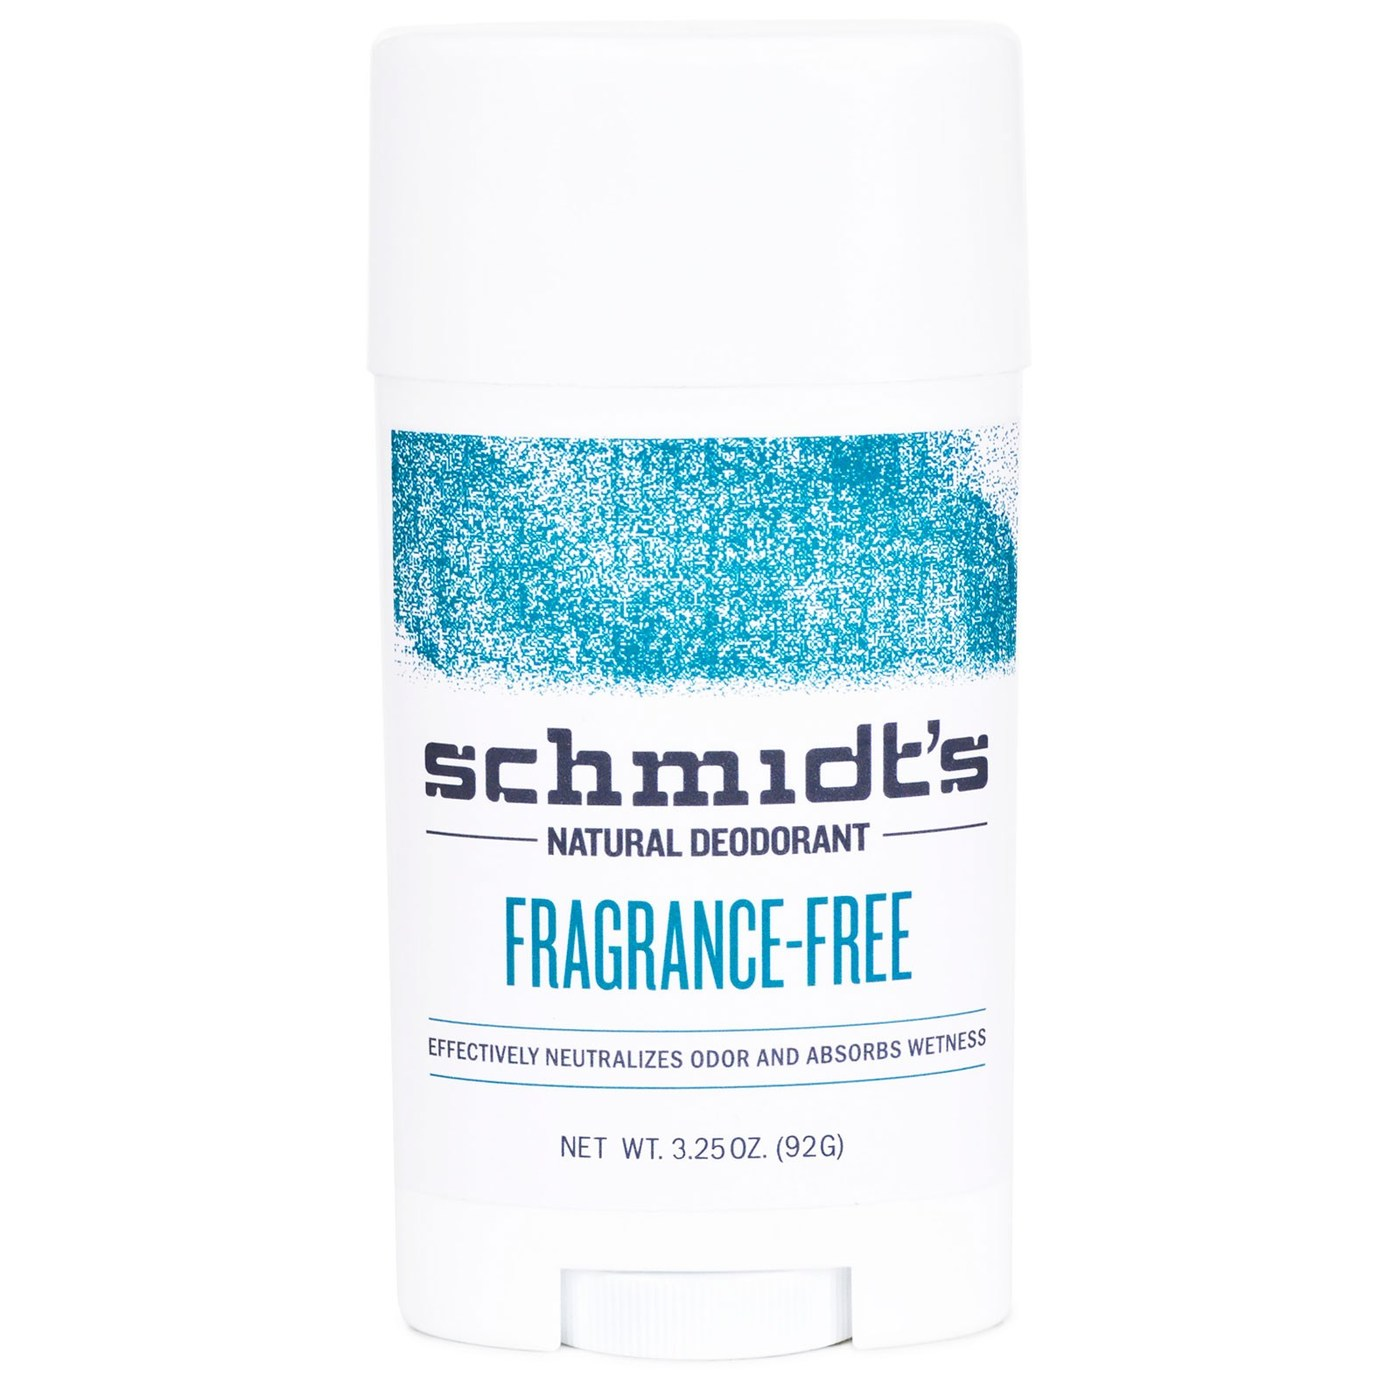 schmidt 39 s natural deodorant stick deodorant fragrance free oz. Black Bedroom Furniture Sets. Home Design Ideas